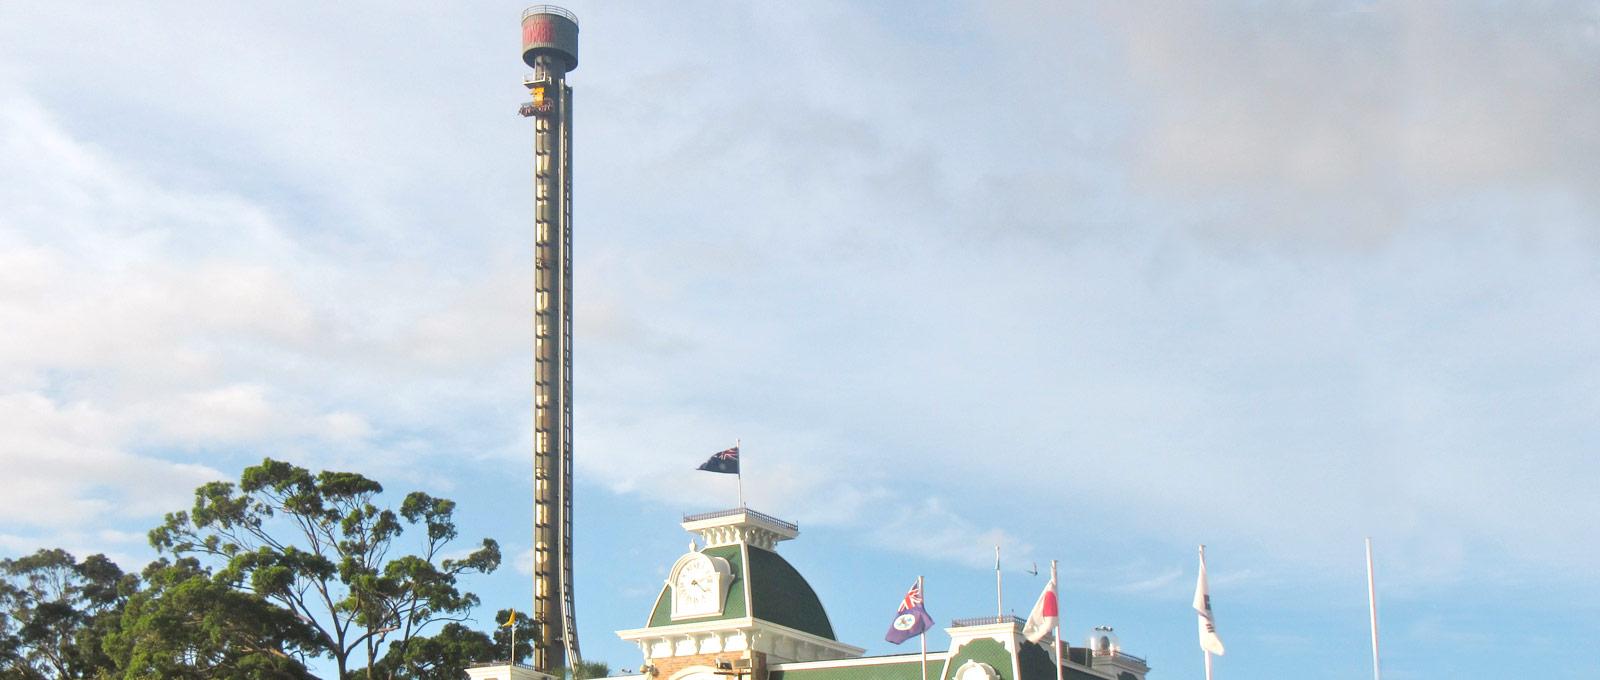 Tower of Terror Dreamworld Gold Coast - Sun Engineering Australia